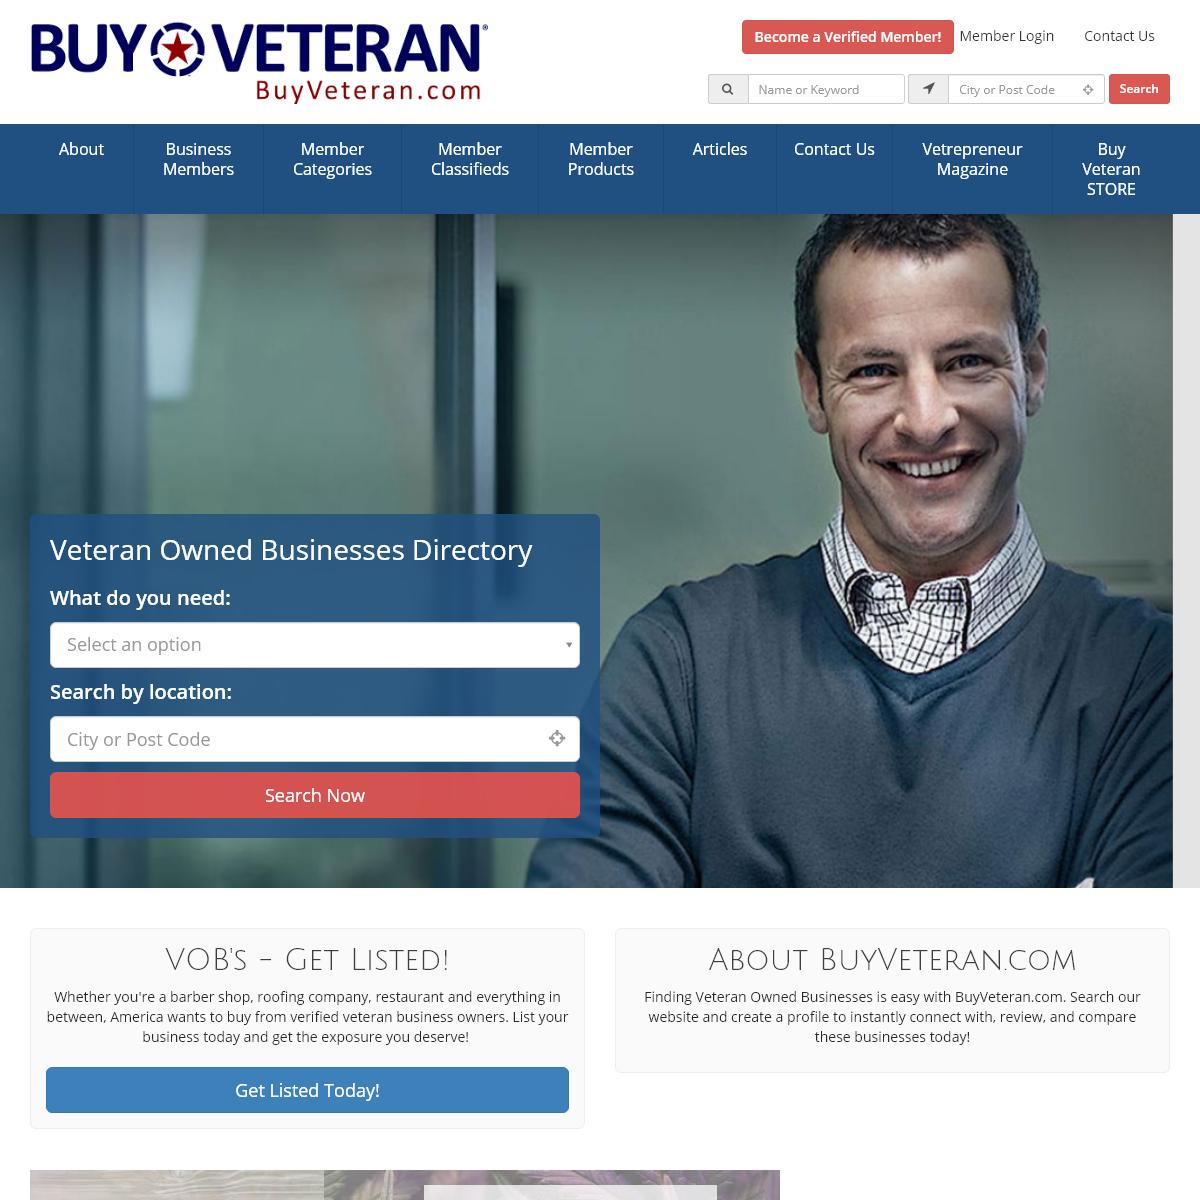 Find Veteran Owned Businesses - BuyVeteran.com